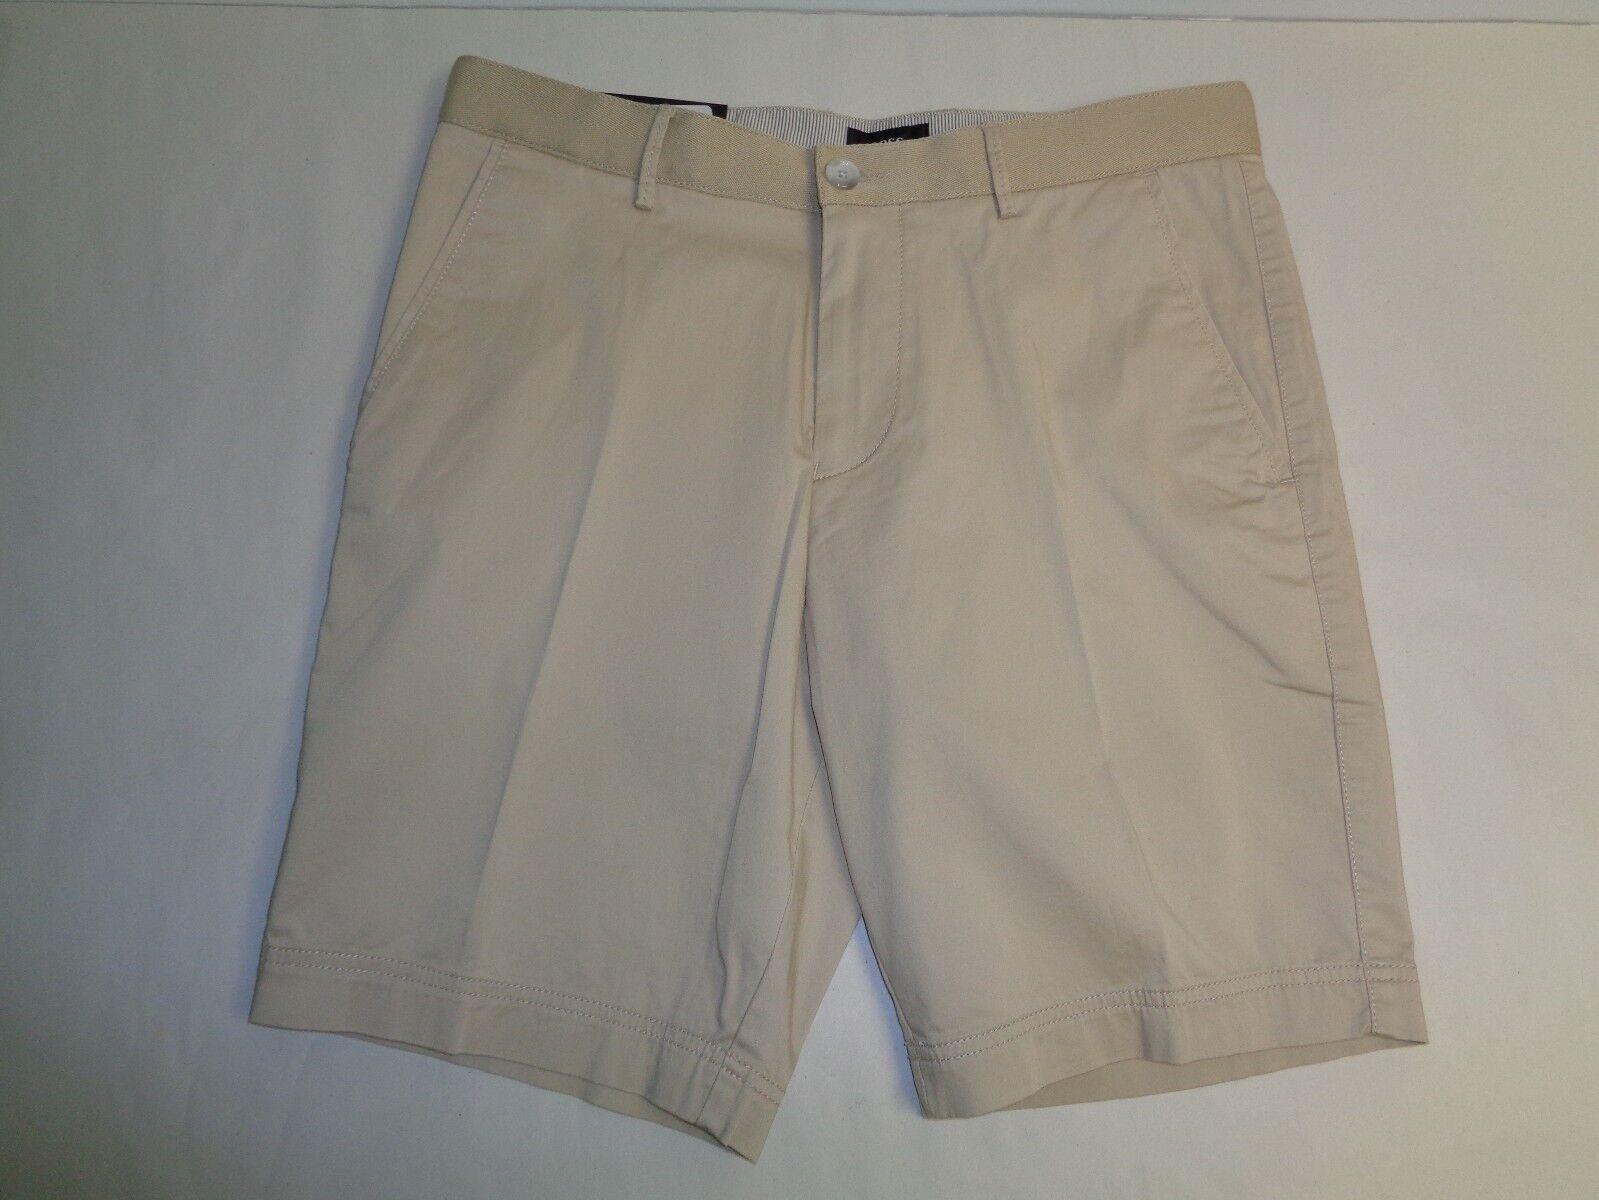 Hugo Boss Size US 30 30R CRIGAN SHORT Beige Regular Fit Shorts New Mens